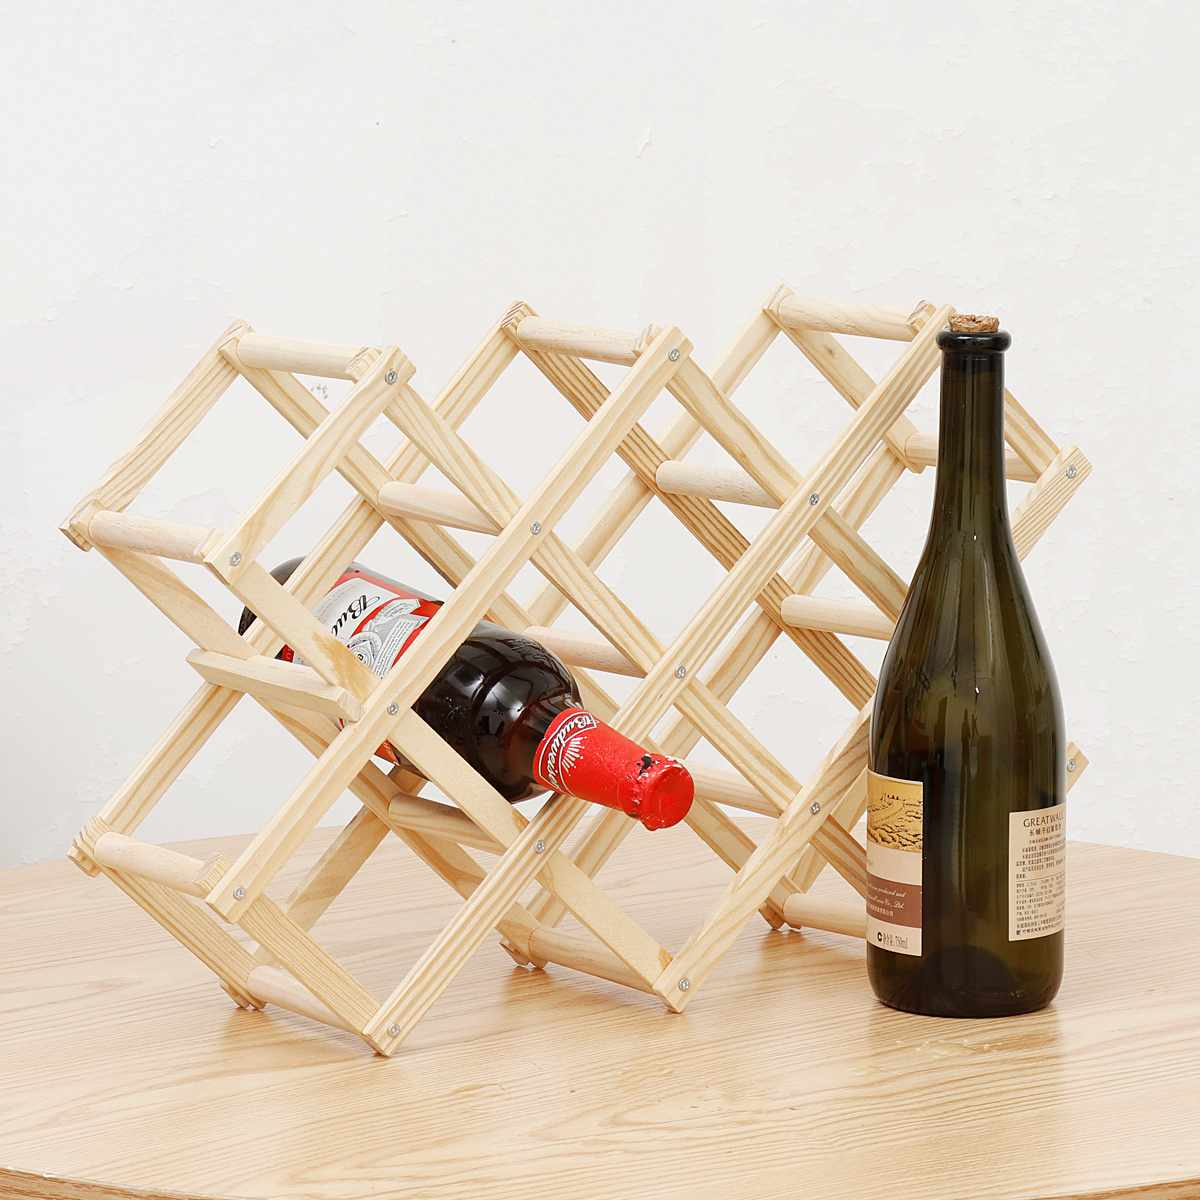 Foldable Wooden Wine Racks Bottle Cabinet Stand Holders Wood Shelf Organizer Storage Living Room Retro Display Cabinet